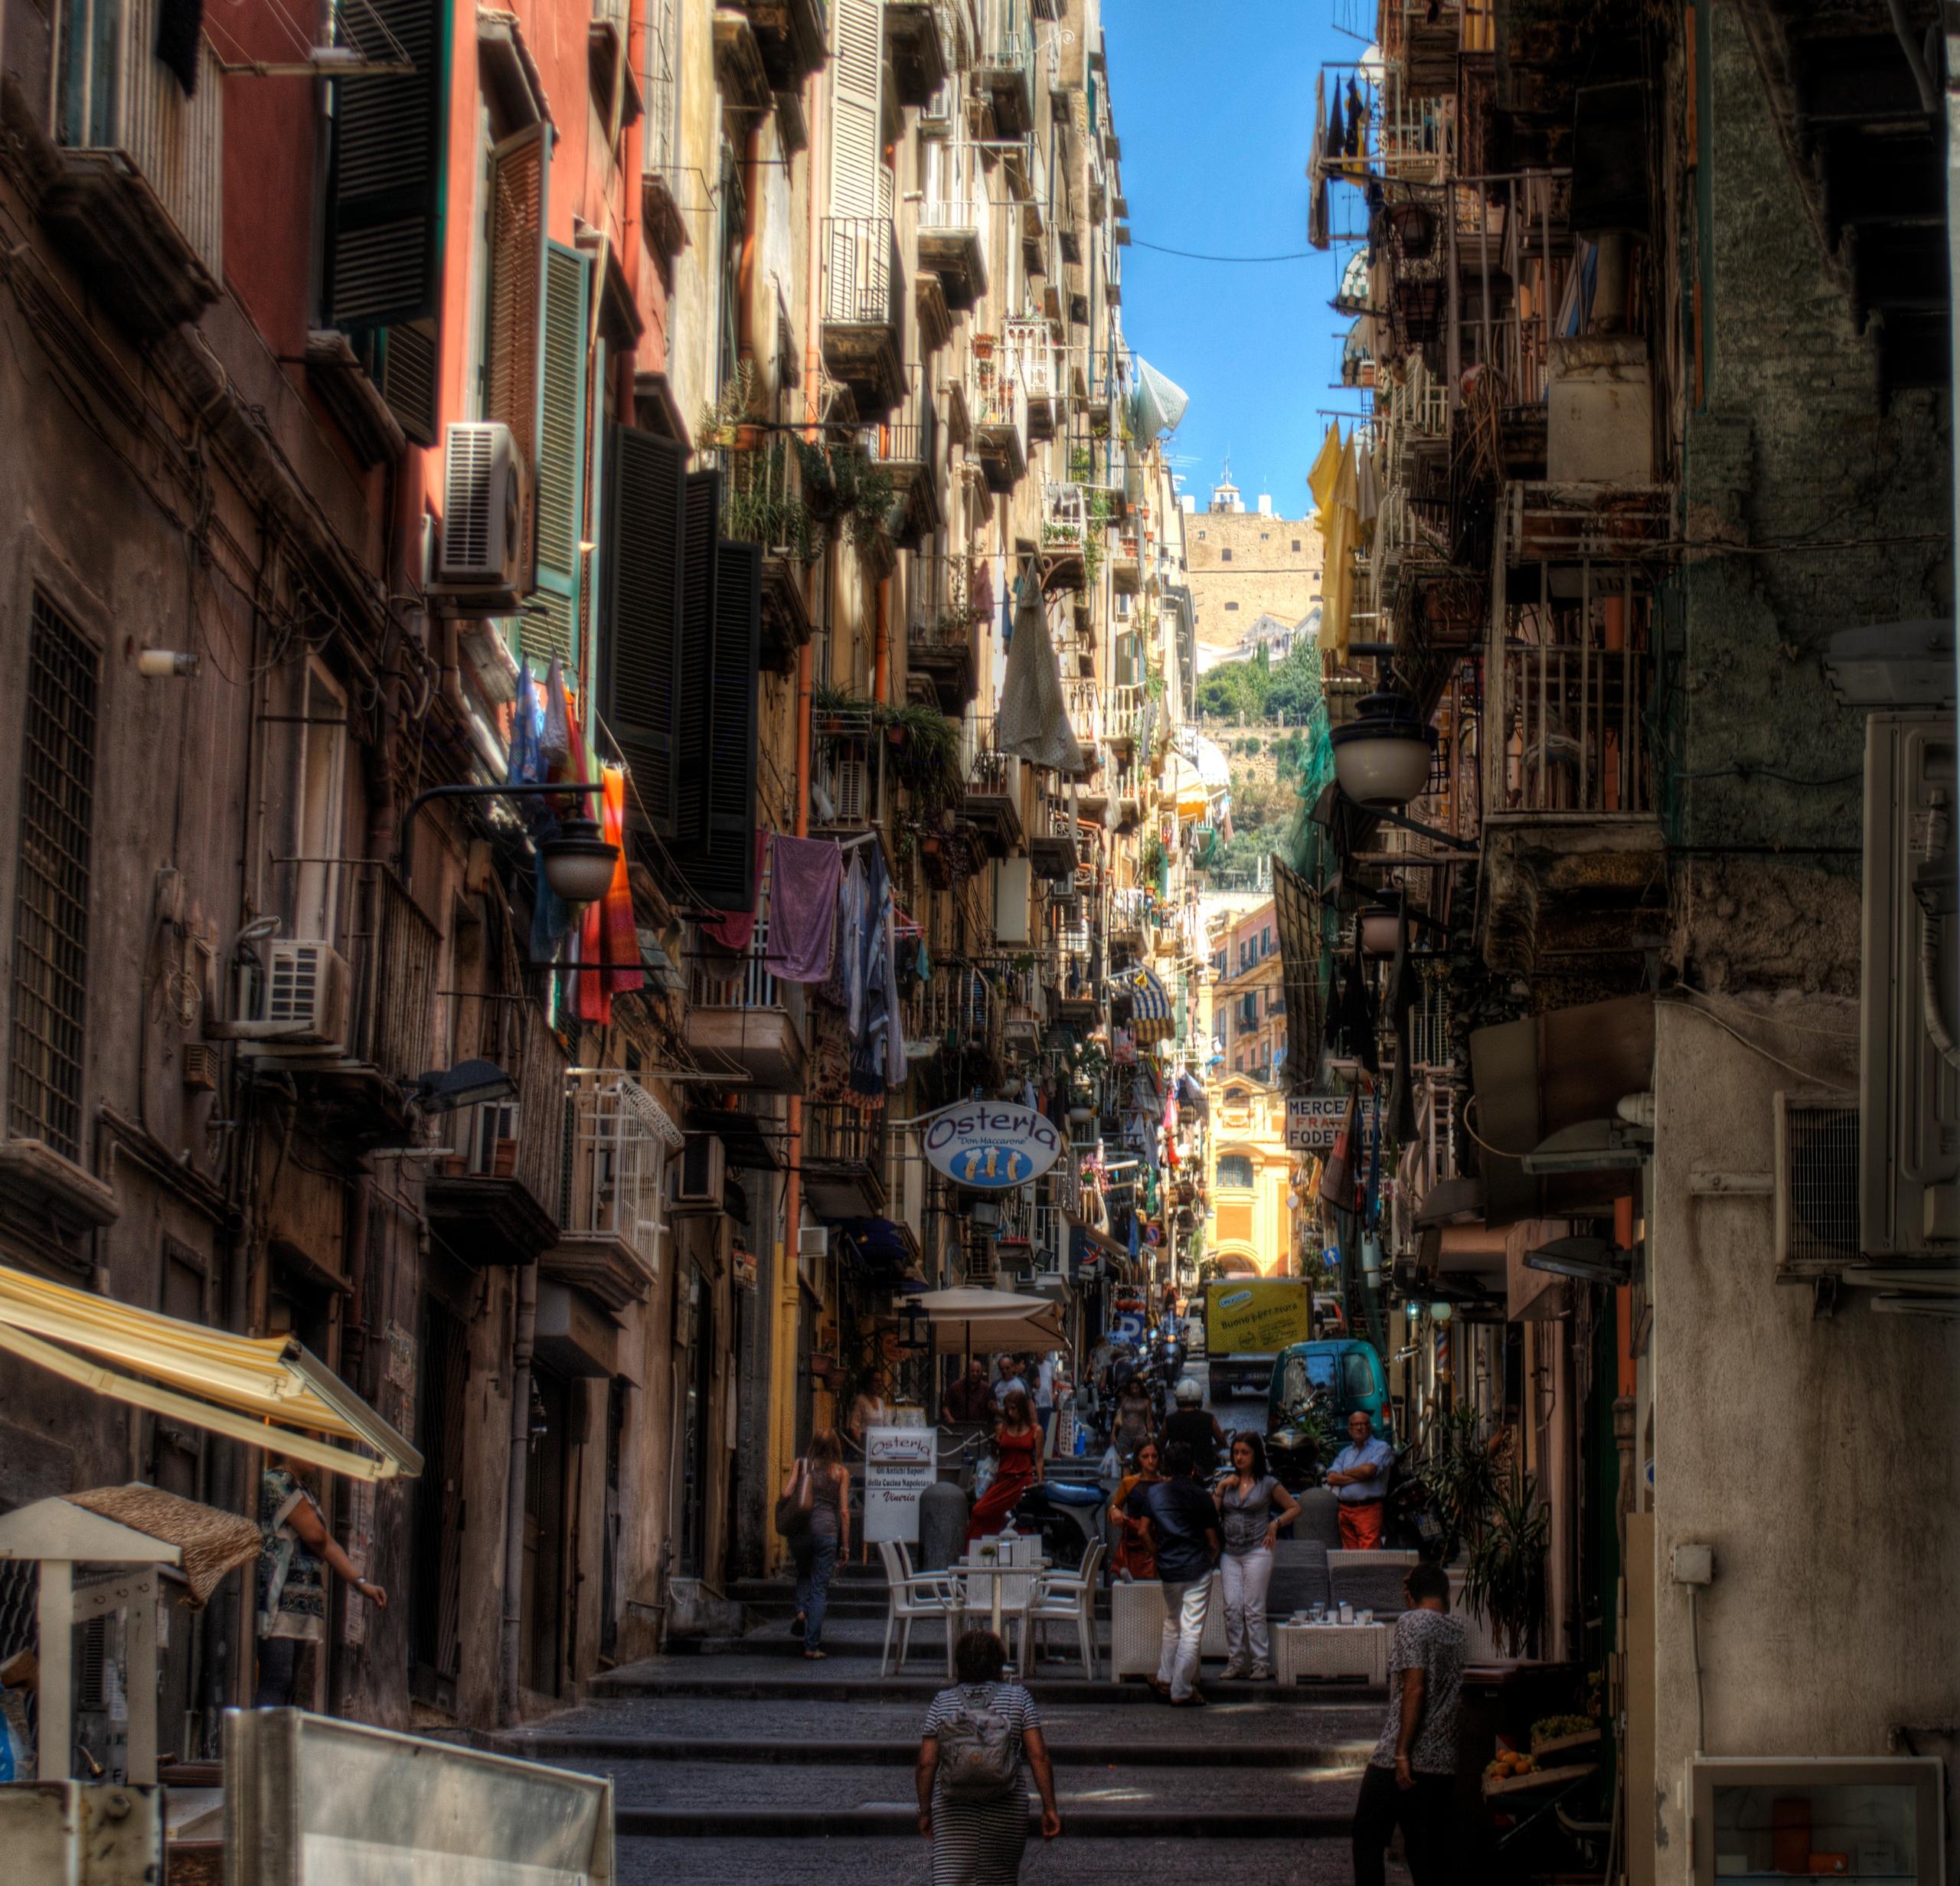 Street Naples - Italy maze narr - neilhoward | ello